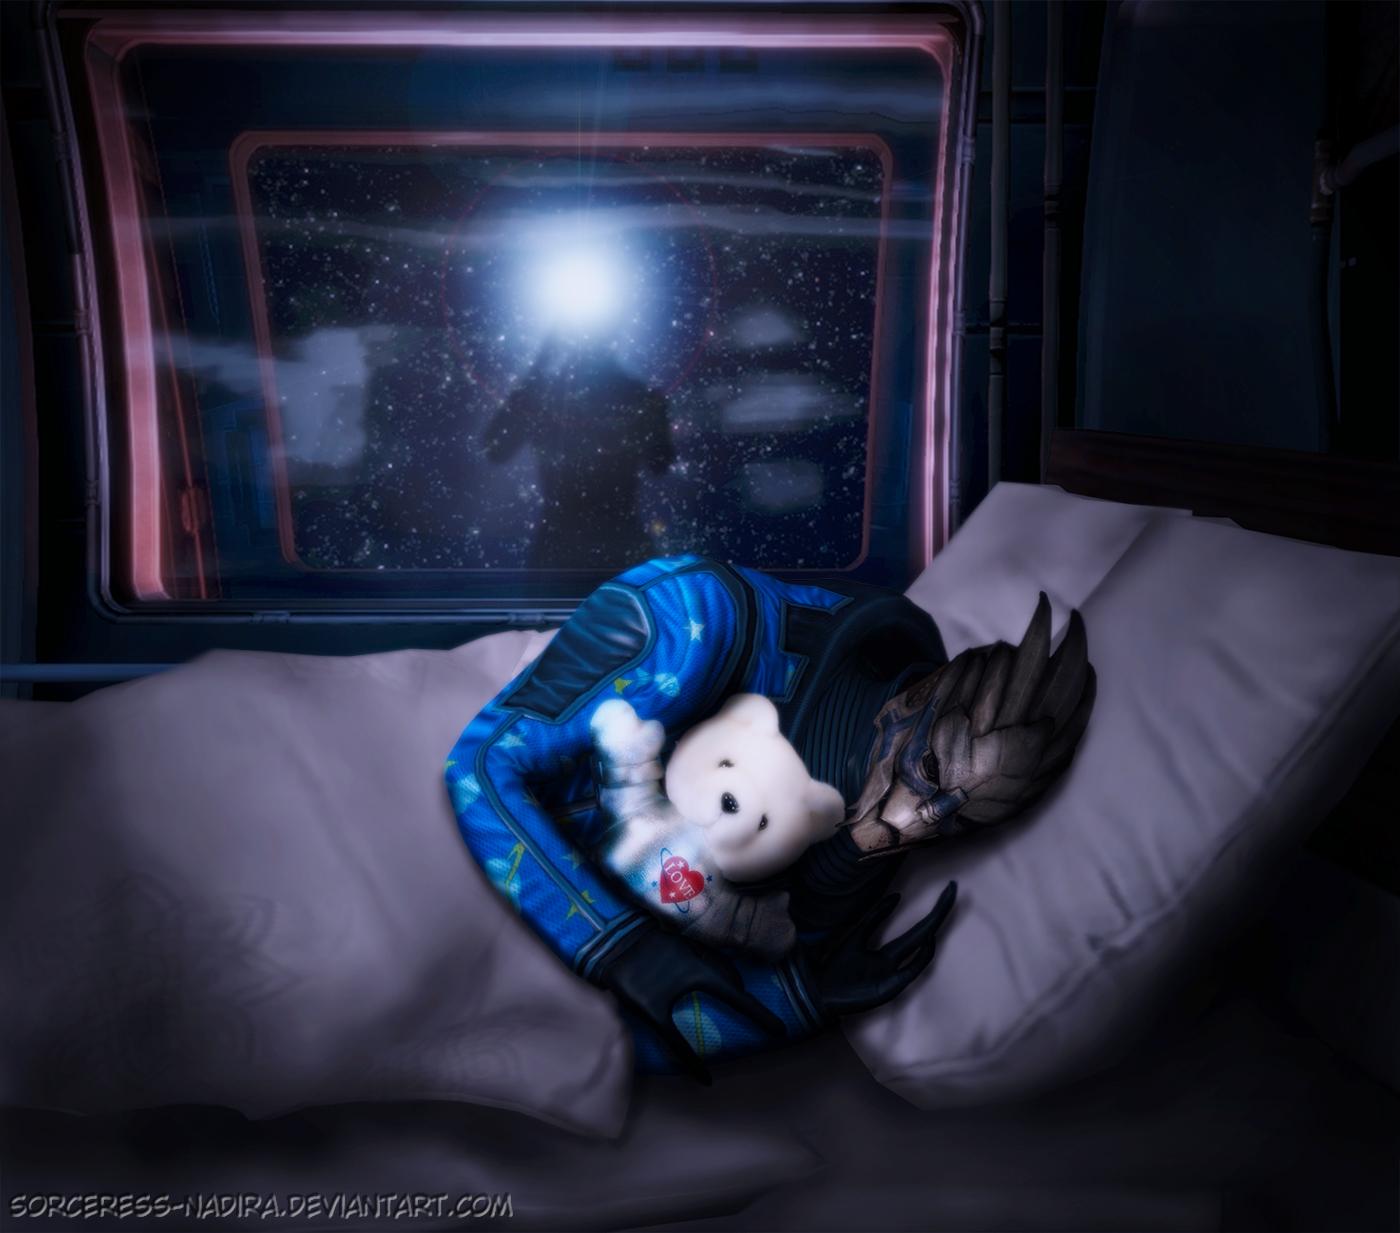 Sweet dreams, Garrus by Sorceress-Nadira